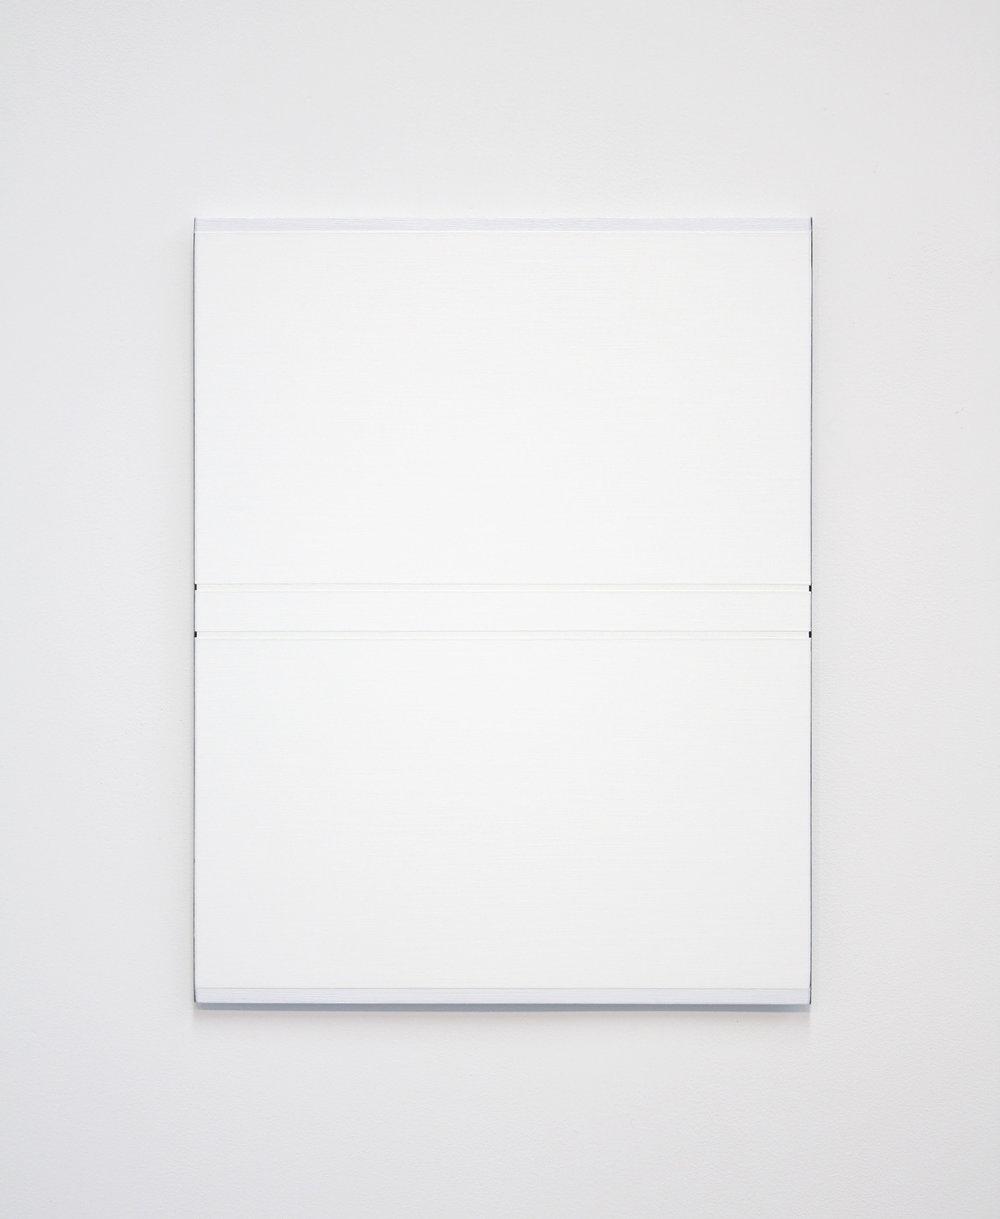 "Untitled, 2012 13.88 x 10.88""   35.3 x 27.5cm"